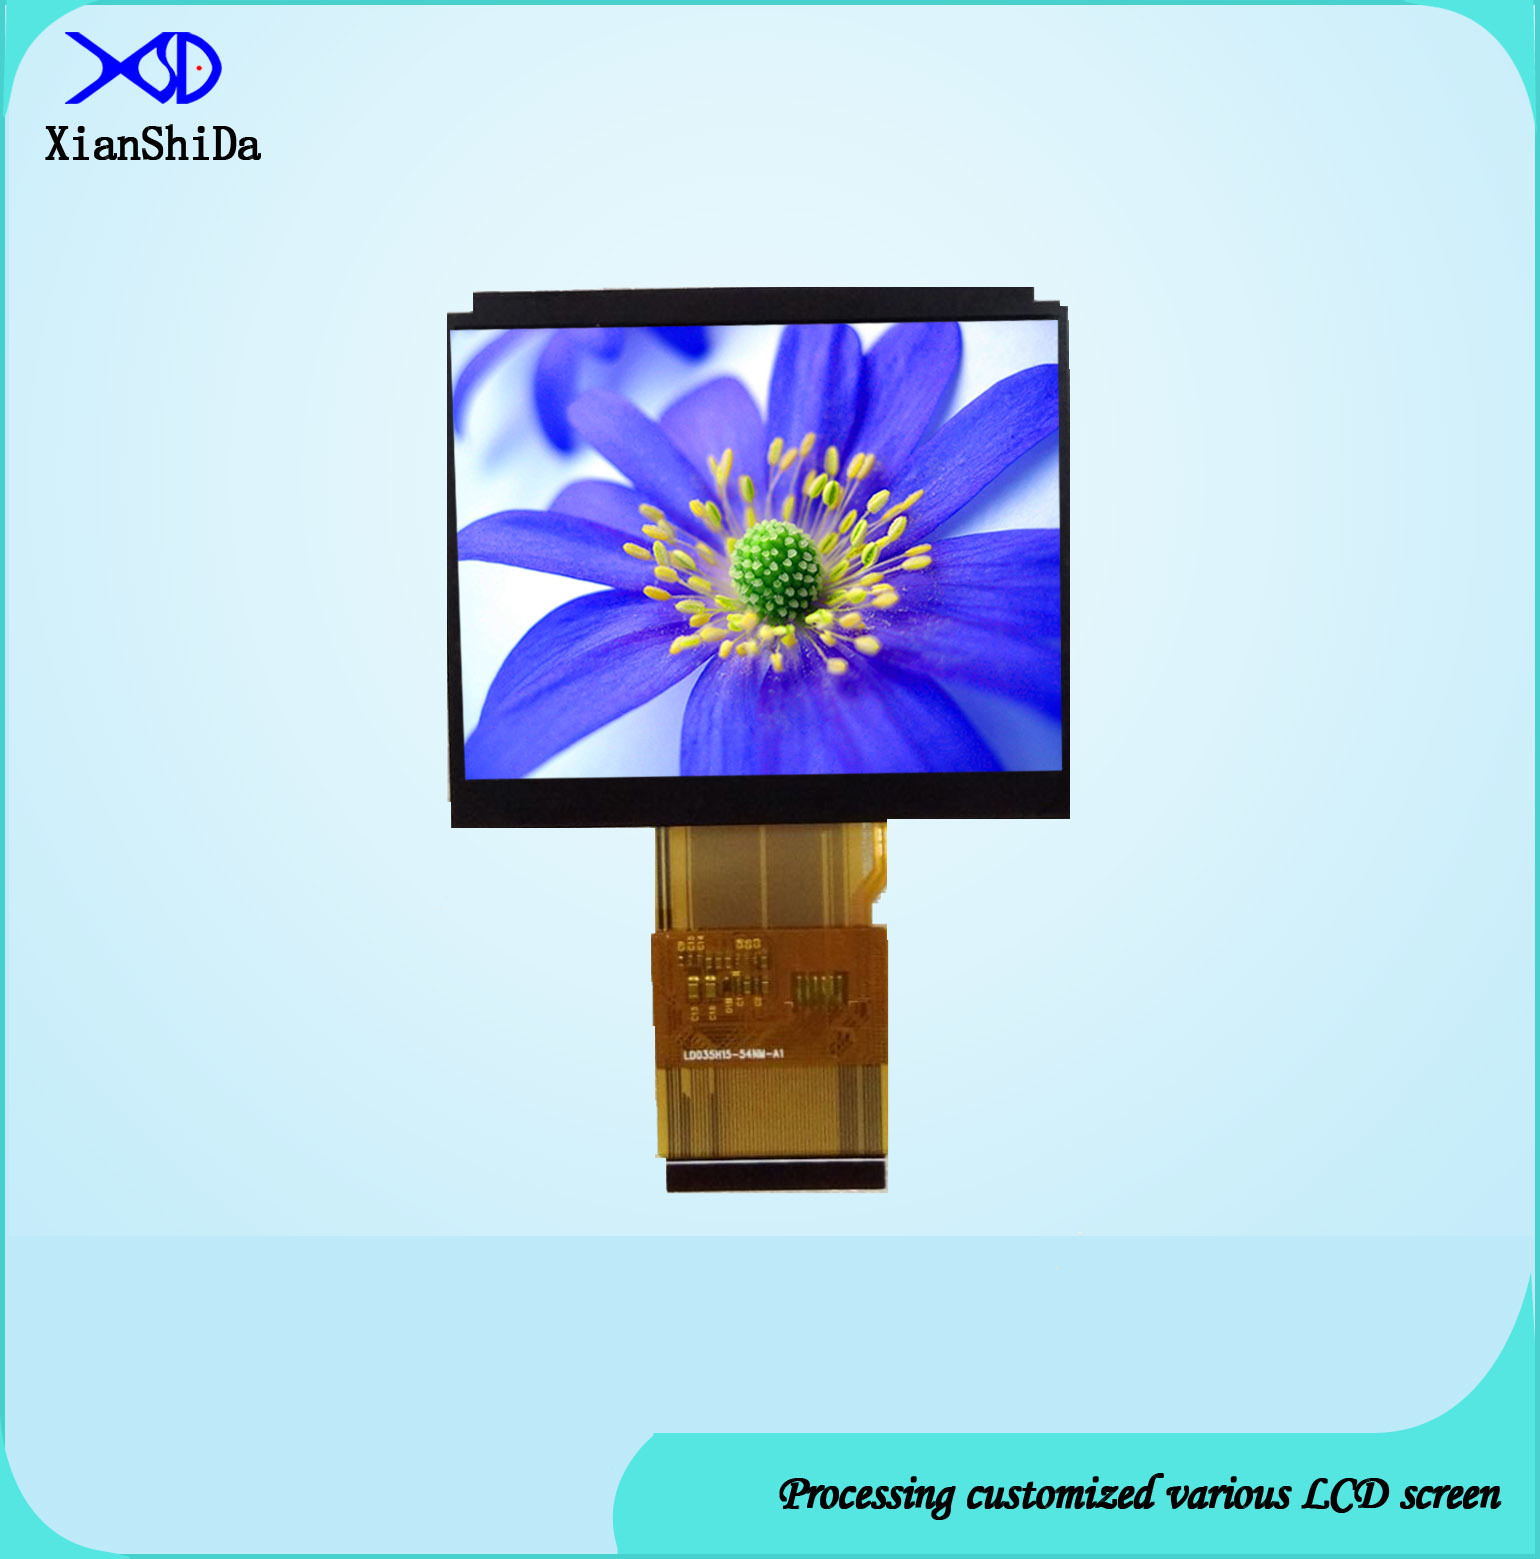 2000CD/M² High Brightness 3.5 Inch TFT LCD Screen 320 (RGB) X240 Resolution